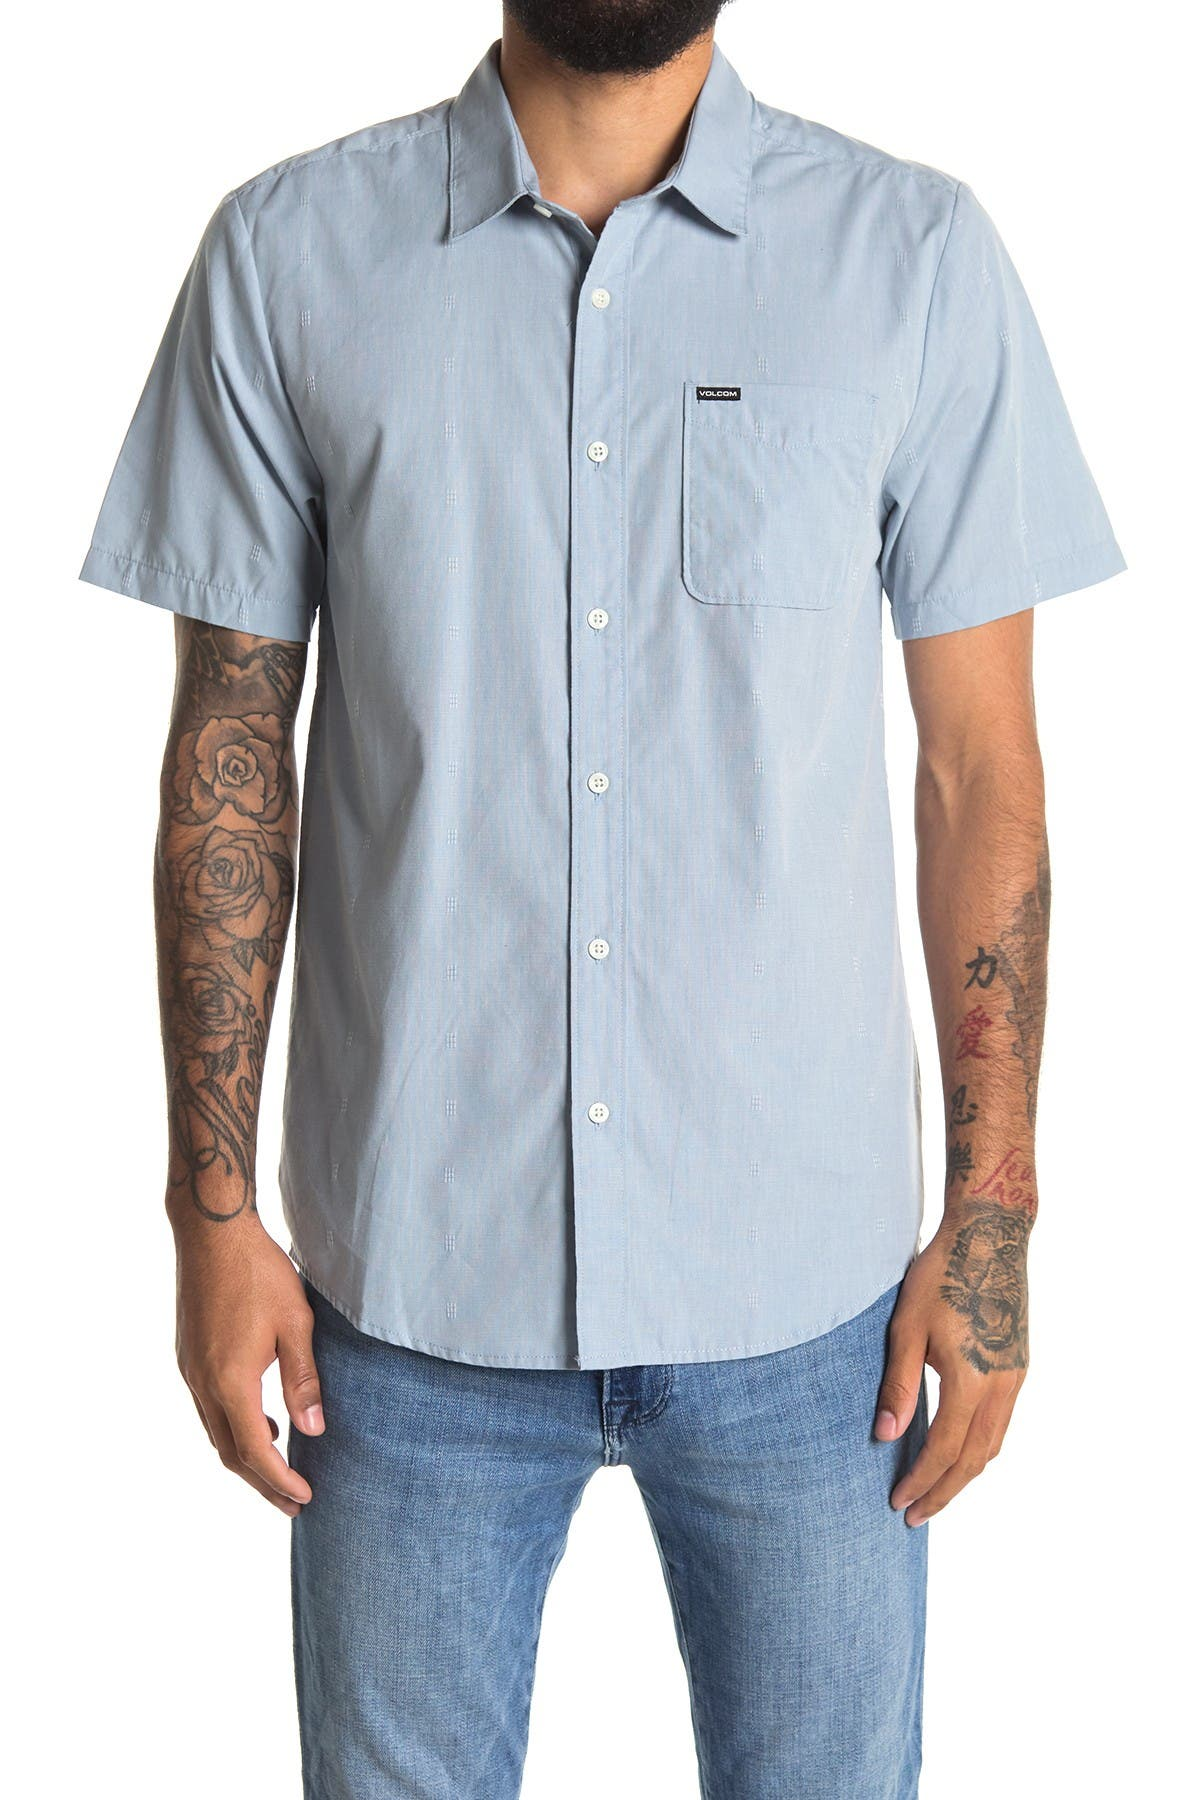 Image of Volcom Newmark Short Sleeve Shirt